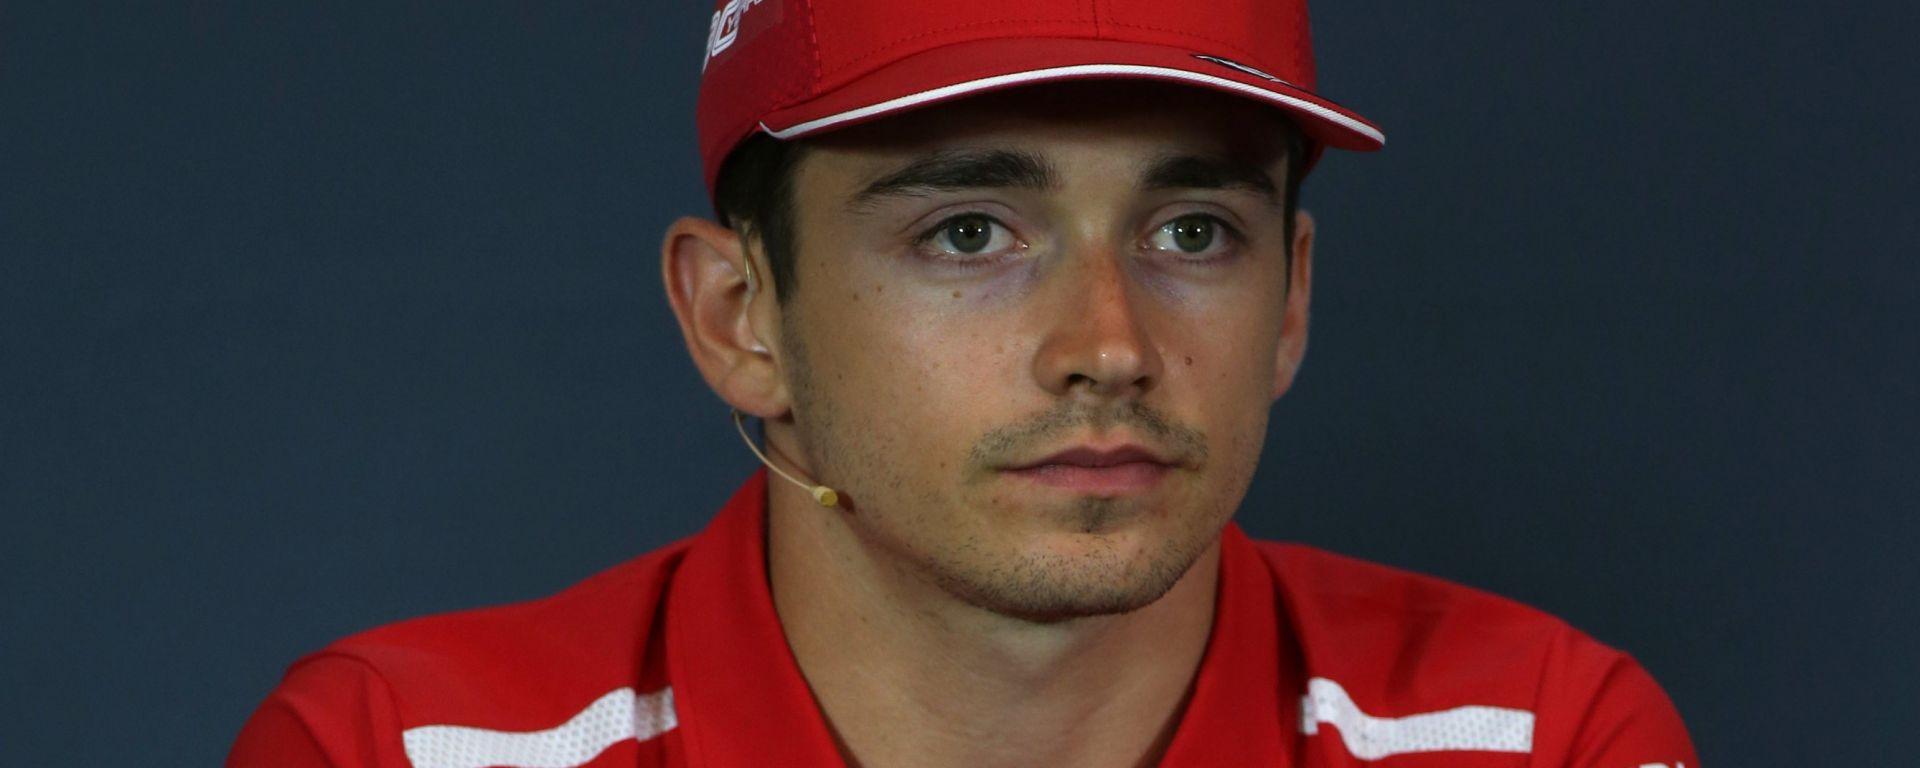 F1 GP Austria 20019, Charles Leclerc (Ferrari)